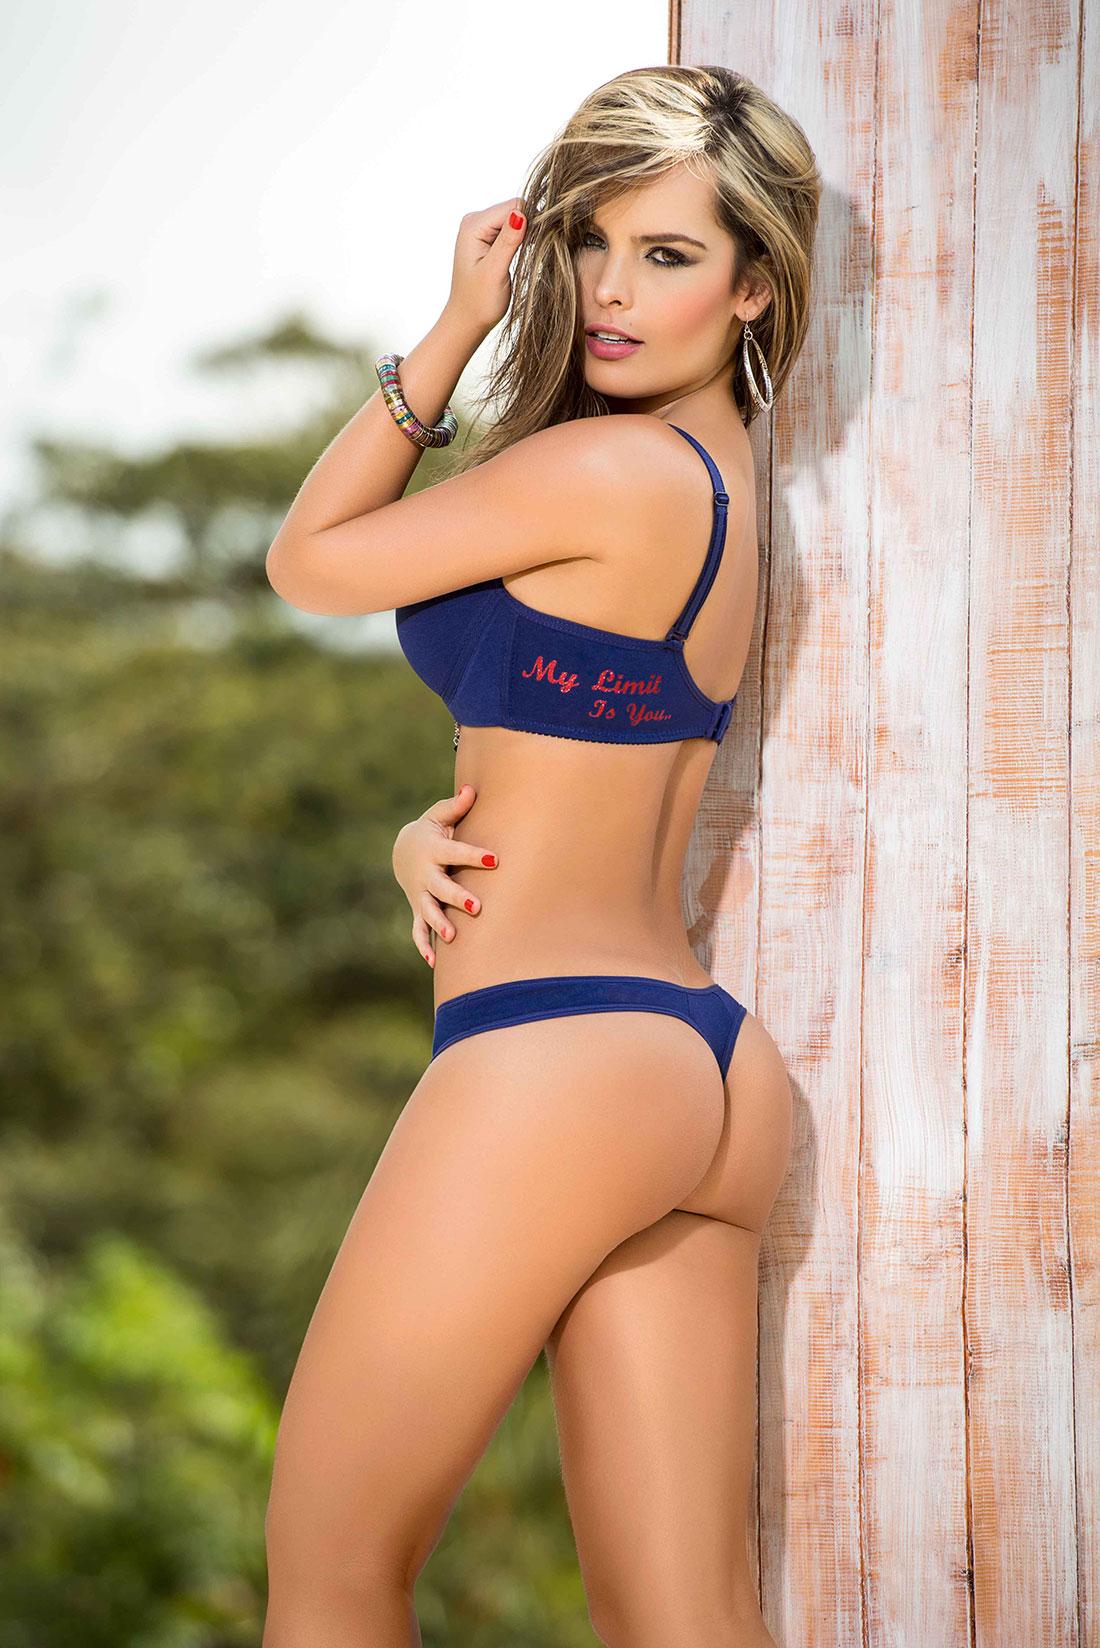 Melissa Giraldo nude (21 photos) Pussy, Facebook, cleavage